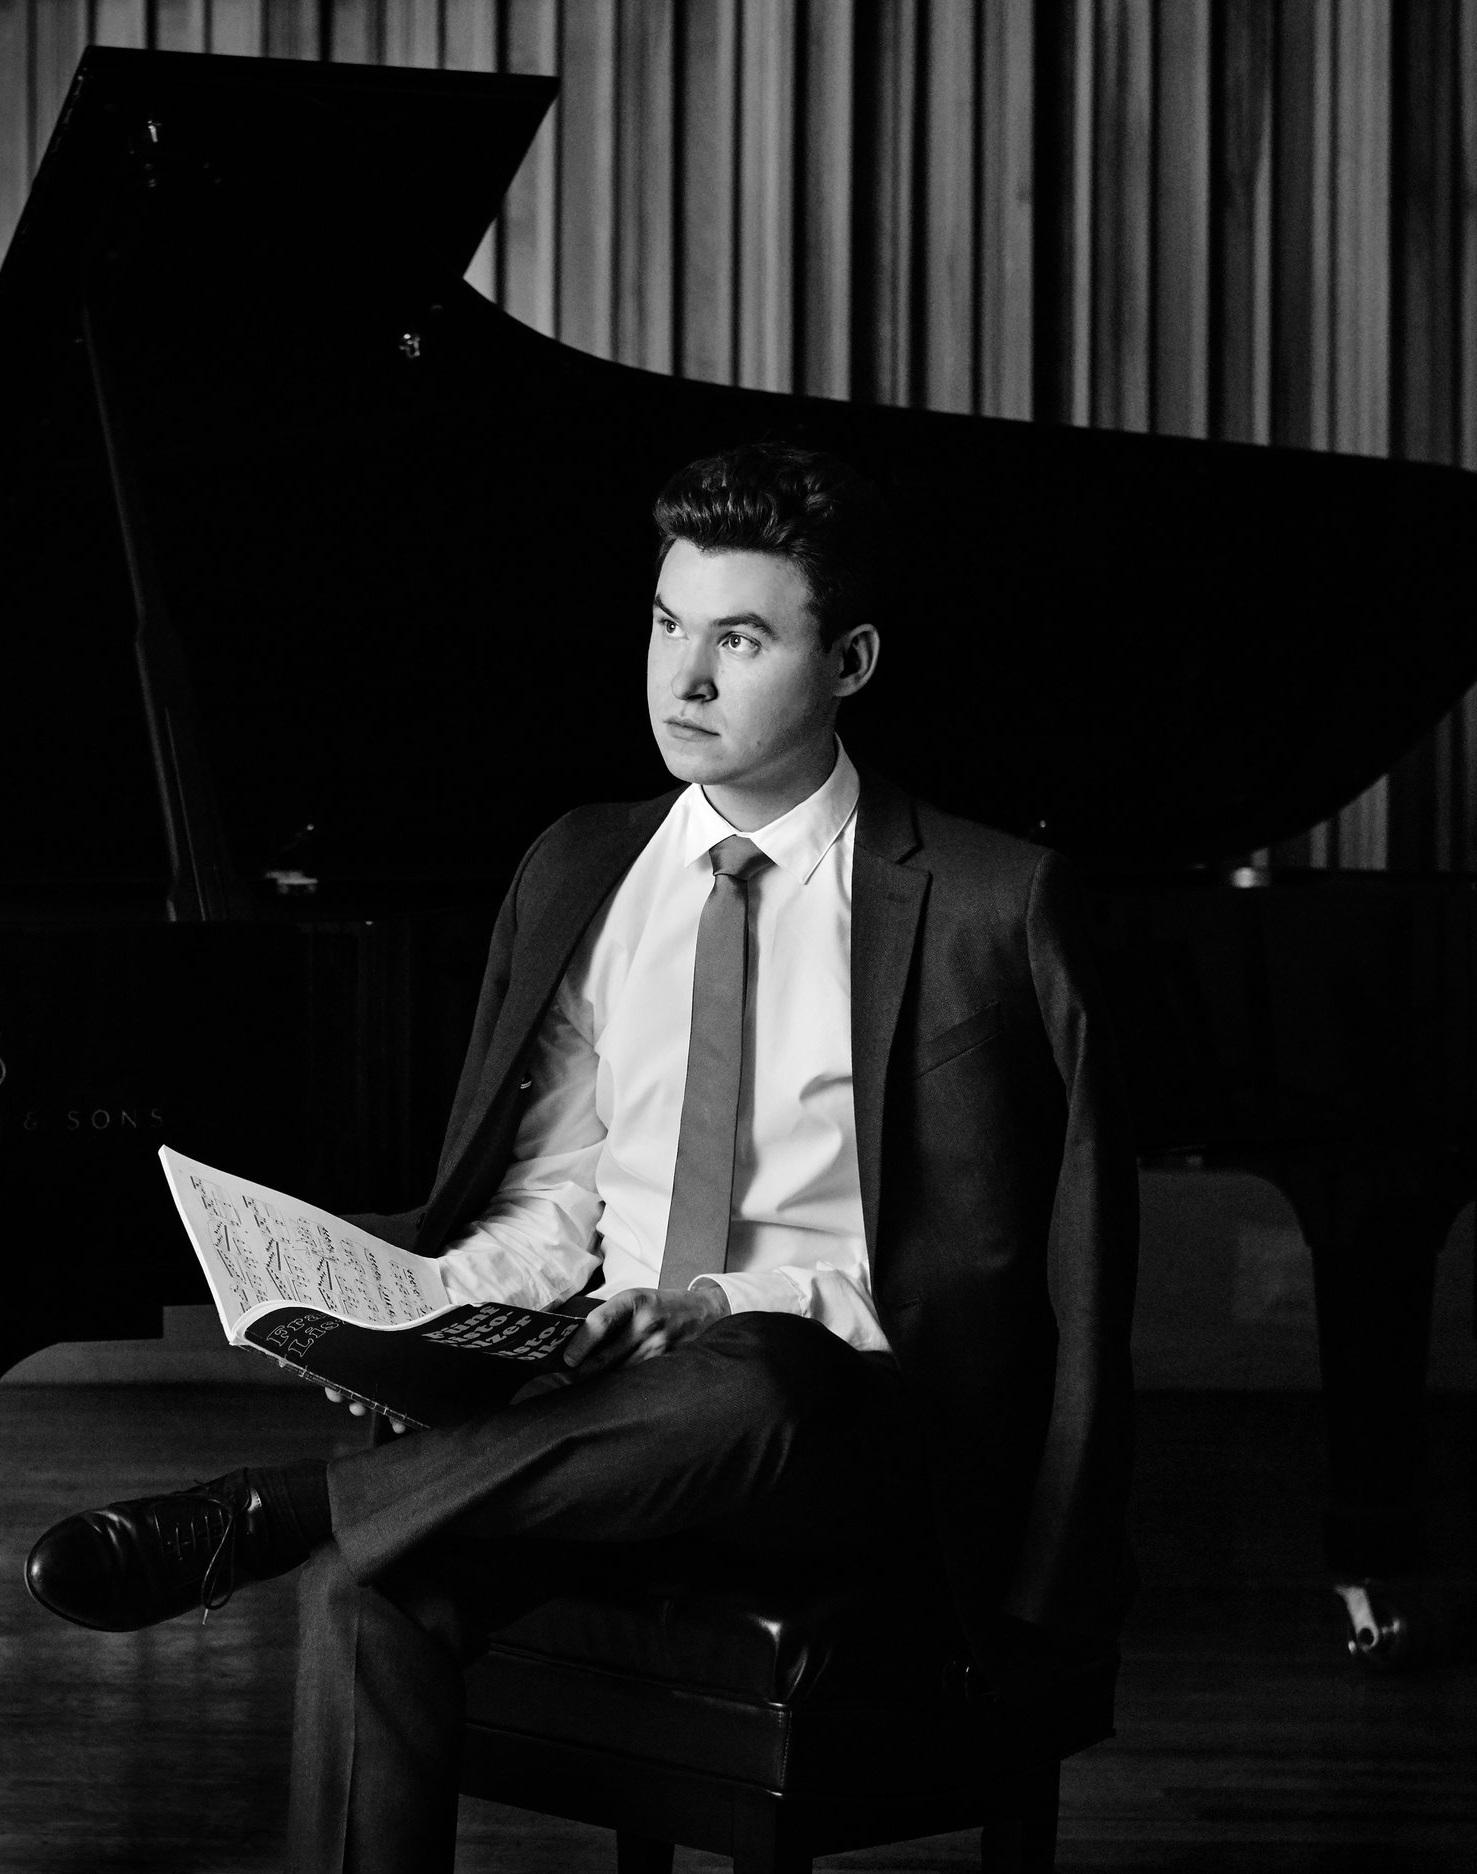 BRAHMS Three Intermezzi, Op. 117 - Matthew Graybil, piano